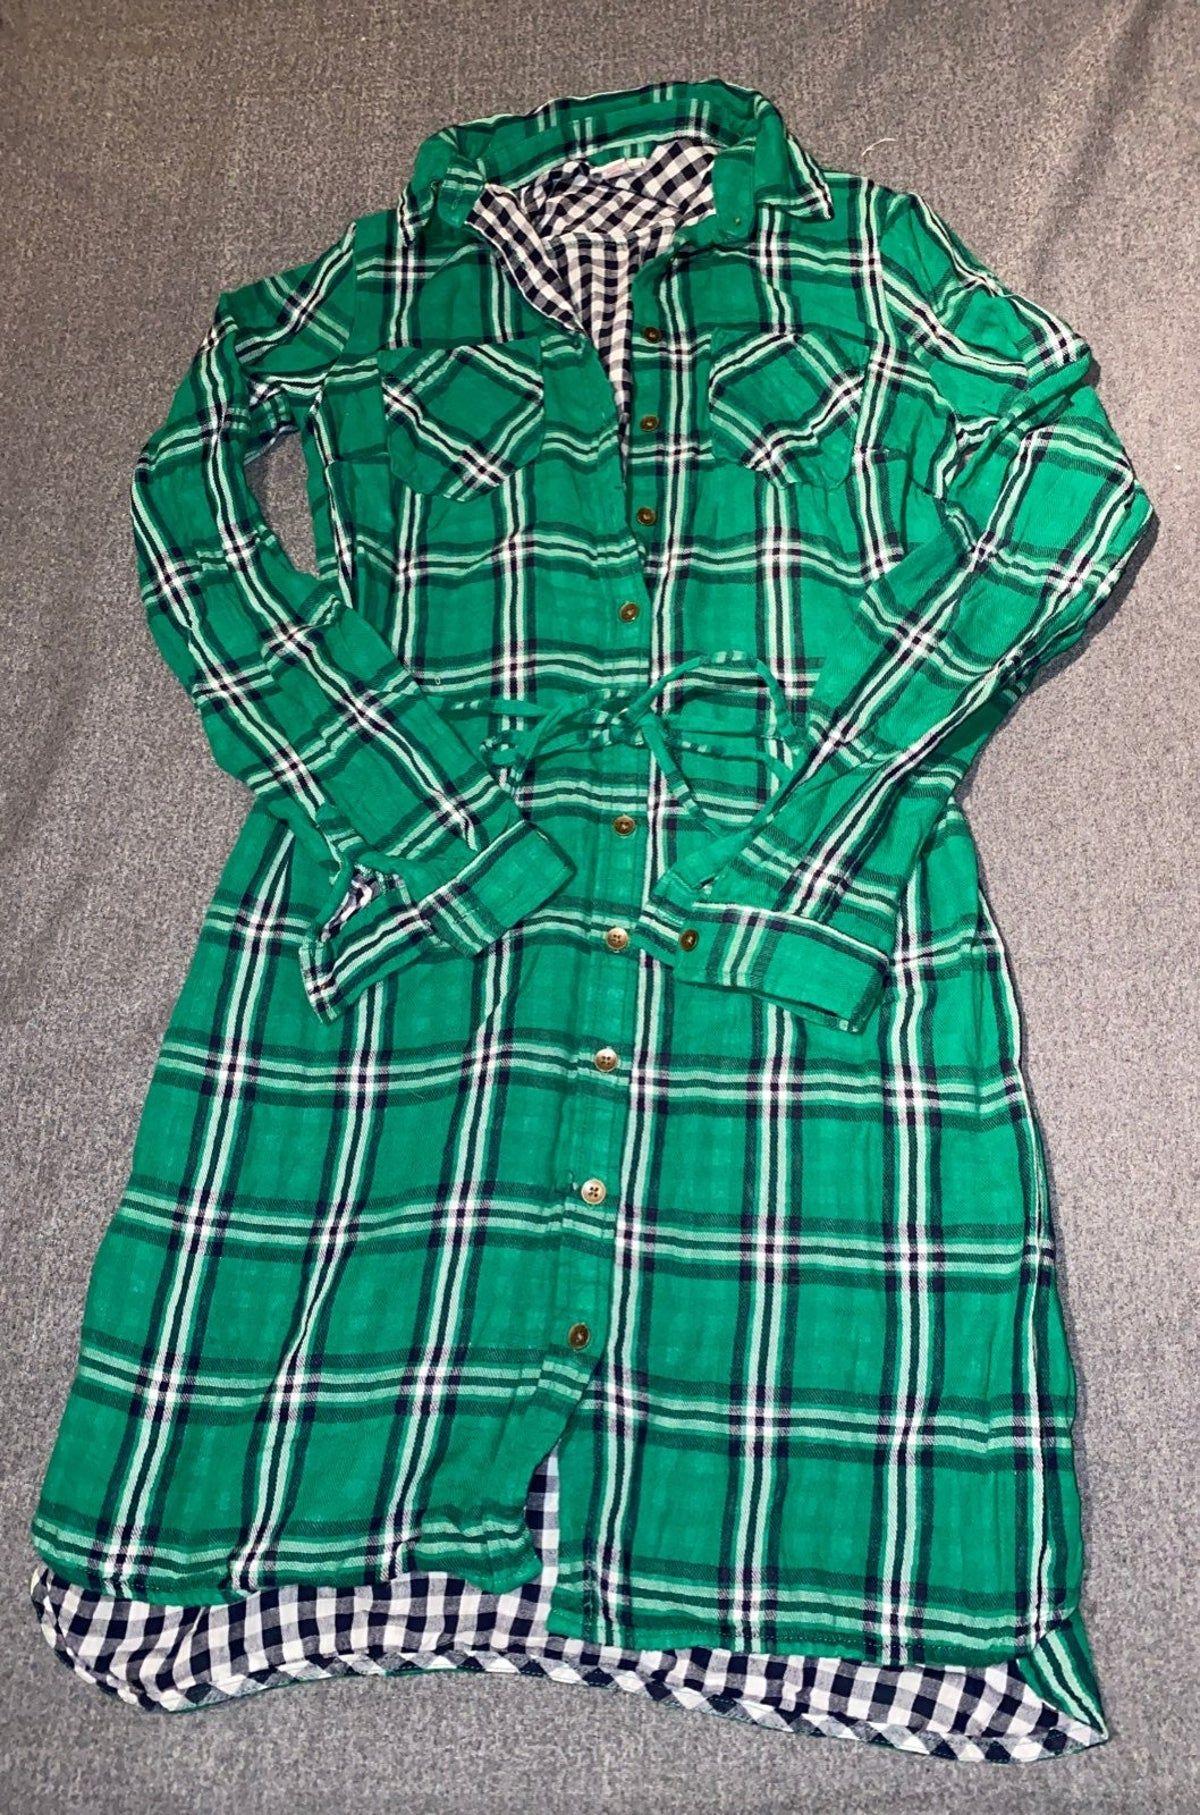 Green Plaid Dress Xs Green Plaid Dress Plaid Dress Dresses Xs [ 1815 x 1200 Pixel ]